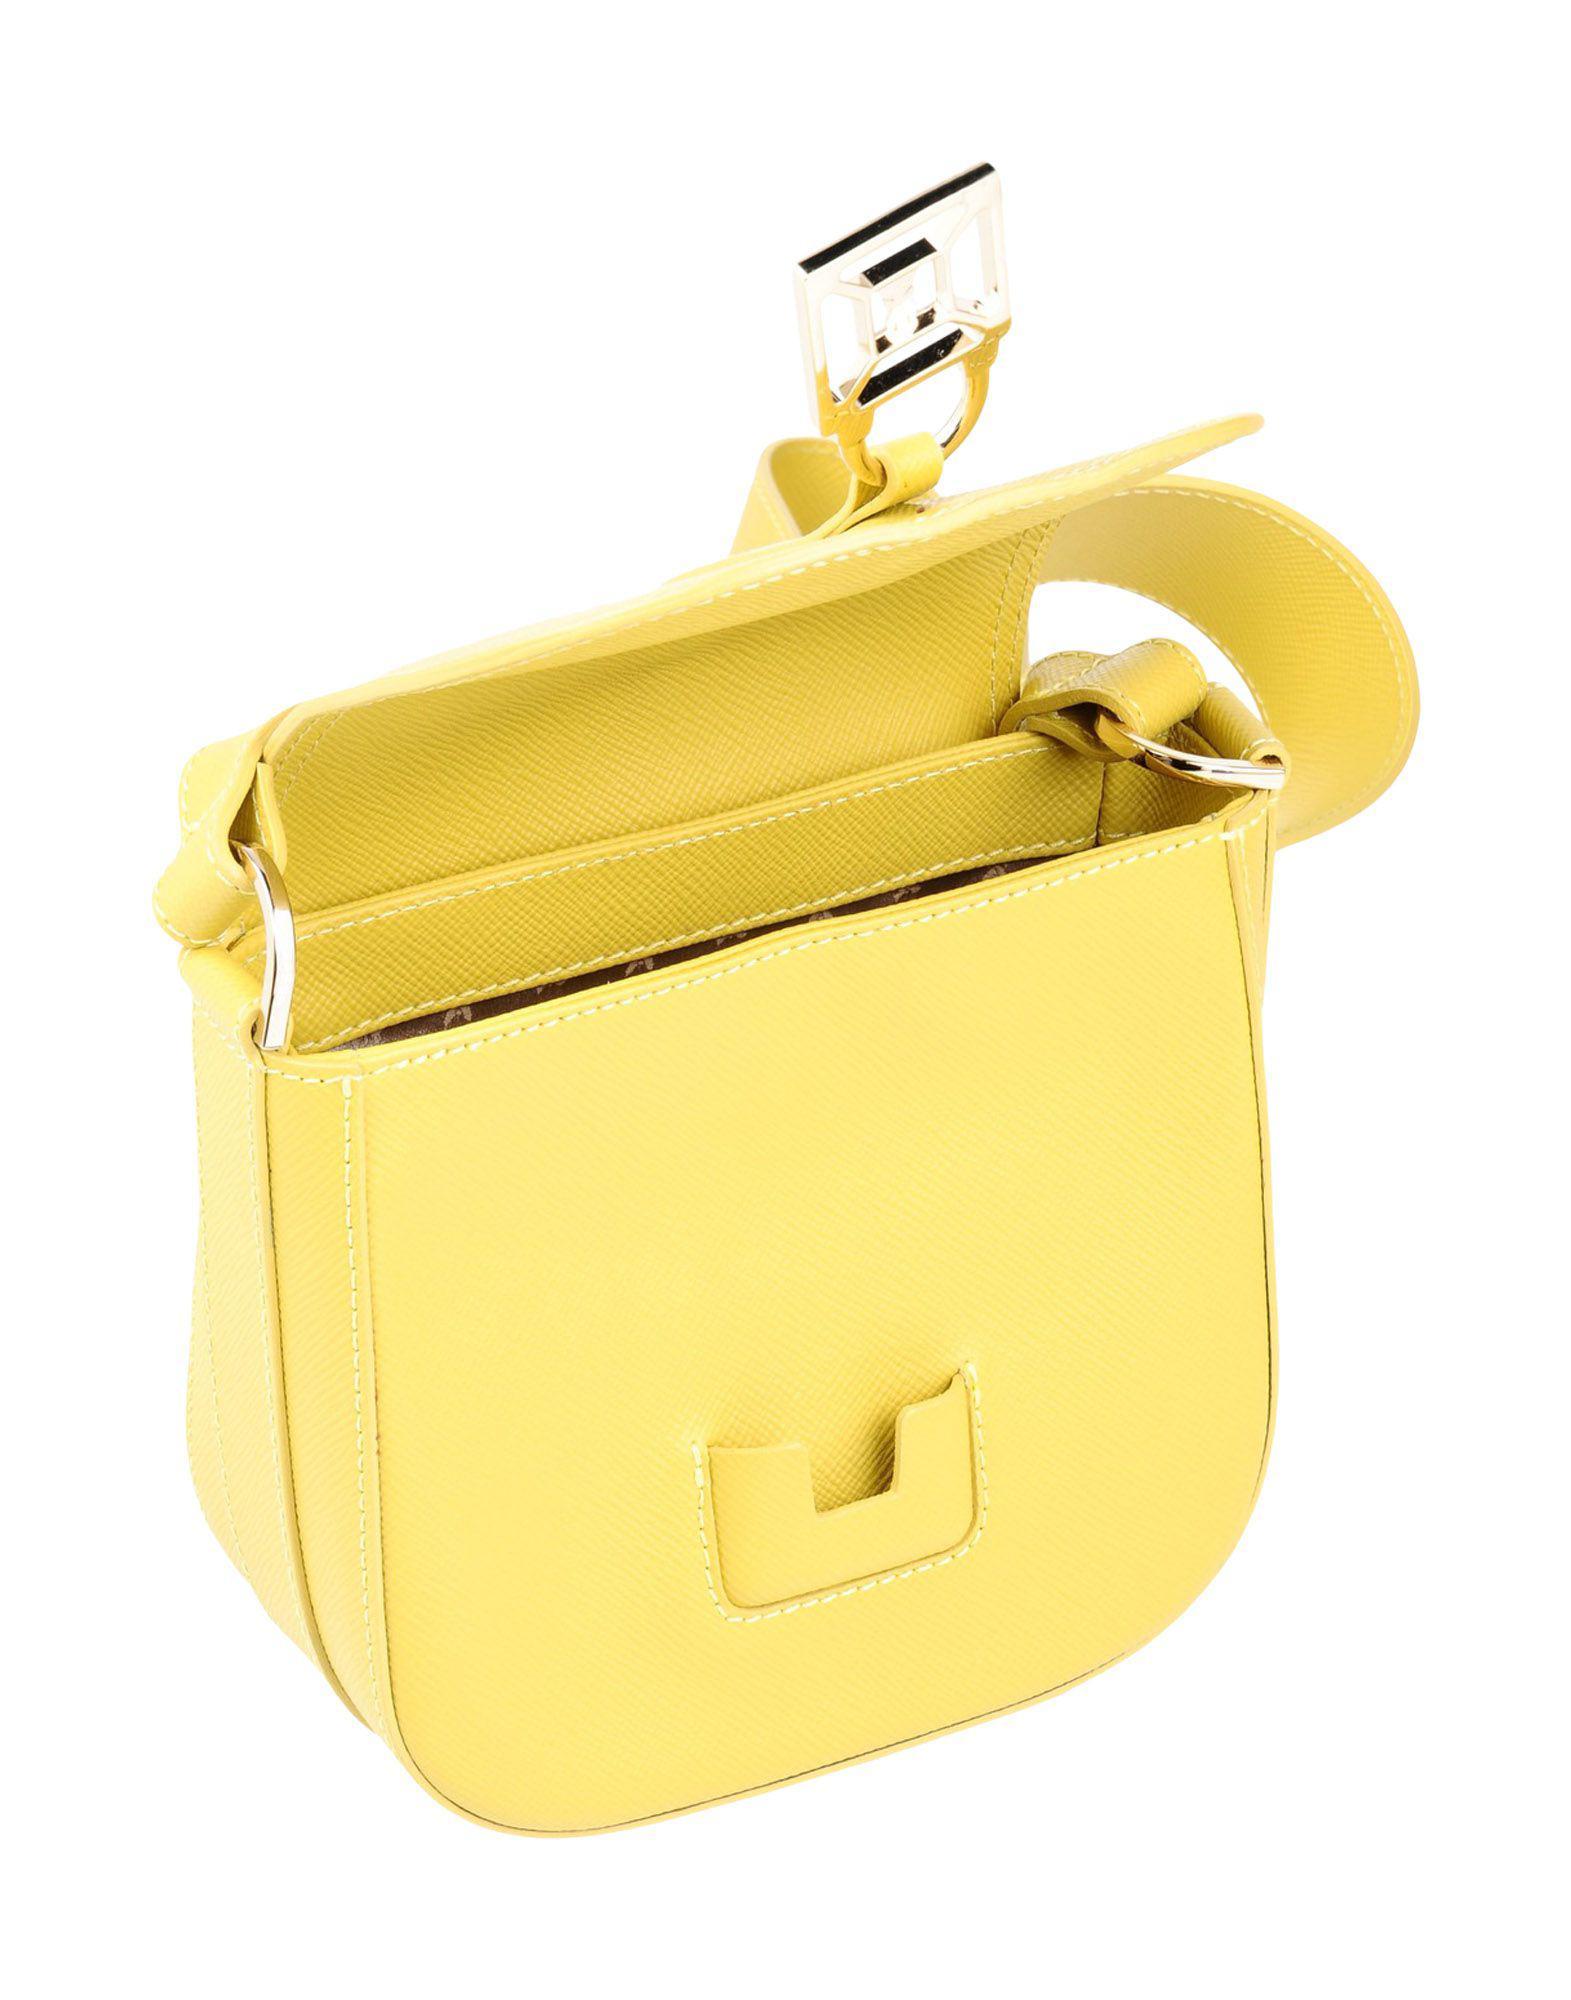 Patrizia Pepe Leather Cross-body Bag in Acid Green (Yellow)